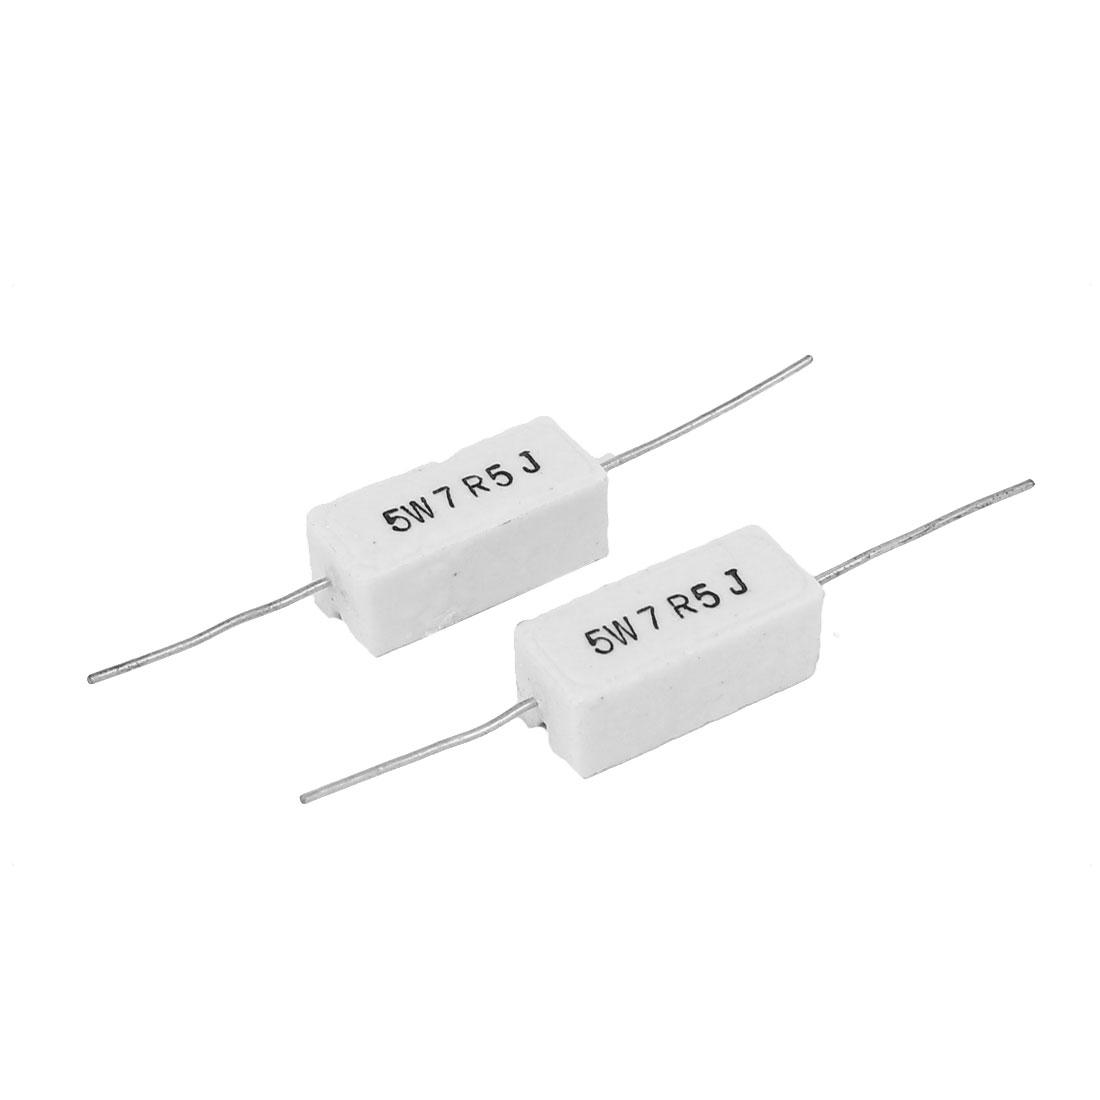 10 Pcs 5W Watt 7.5 Ohm J(+/-5%) Ceramic Cement Electric Power Resistor White - image 1 of 2